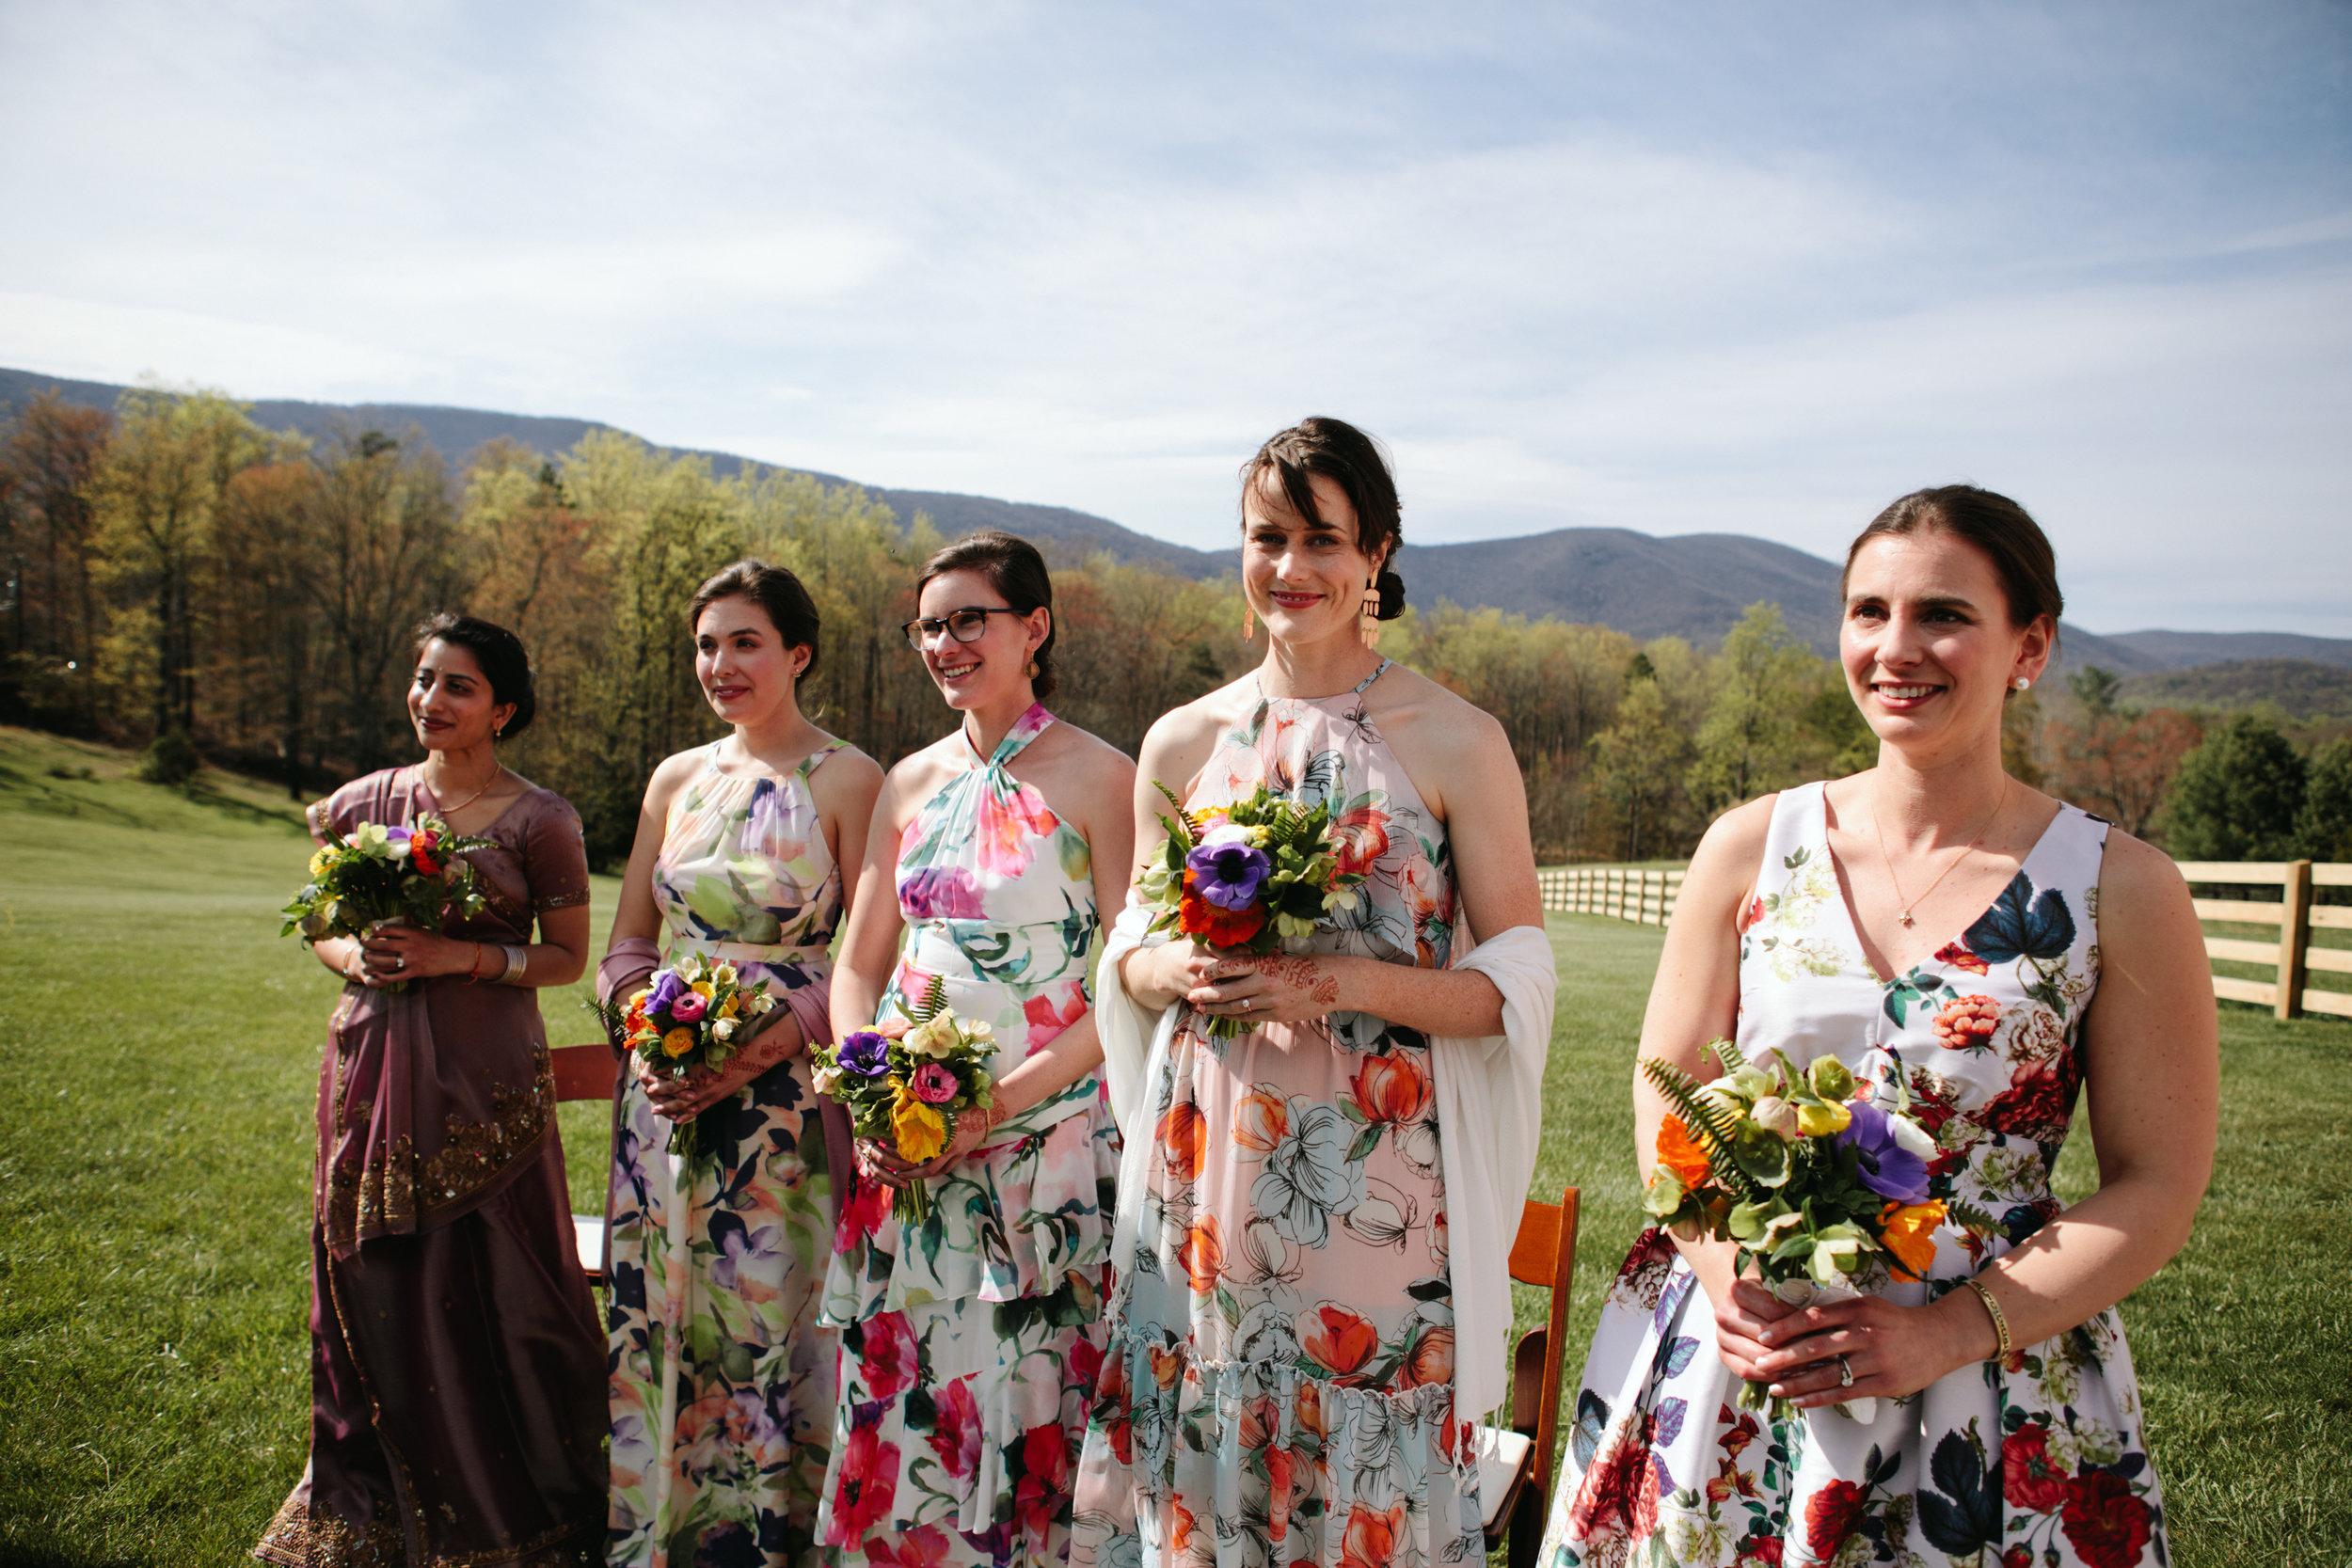 maine-interfaith-wedding-photographer-68.jpg